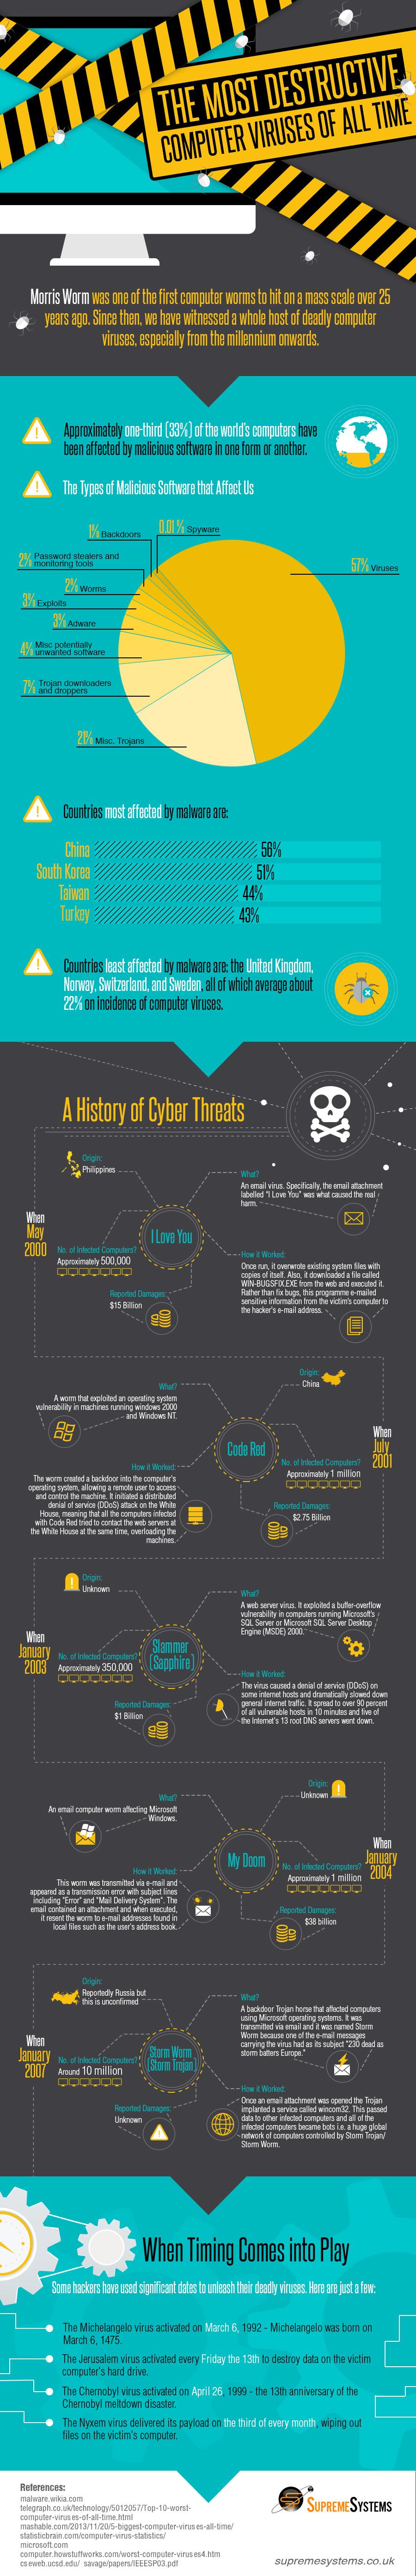 Most-destructive-computer-viruses-Infographic